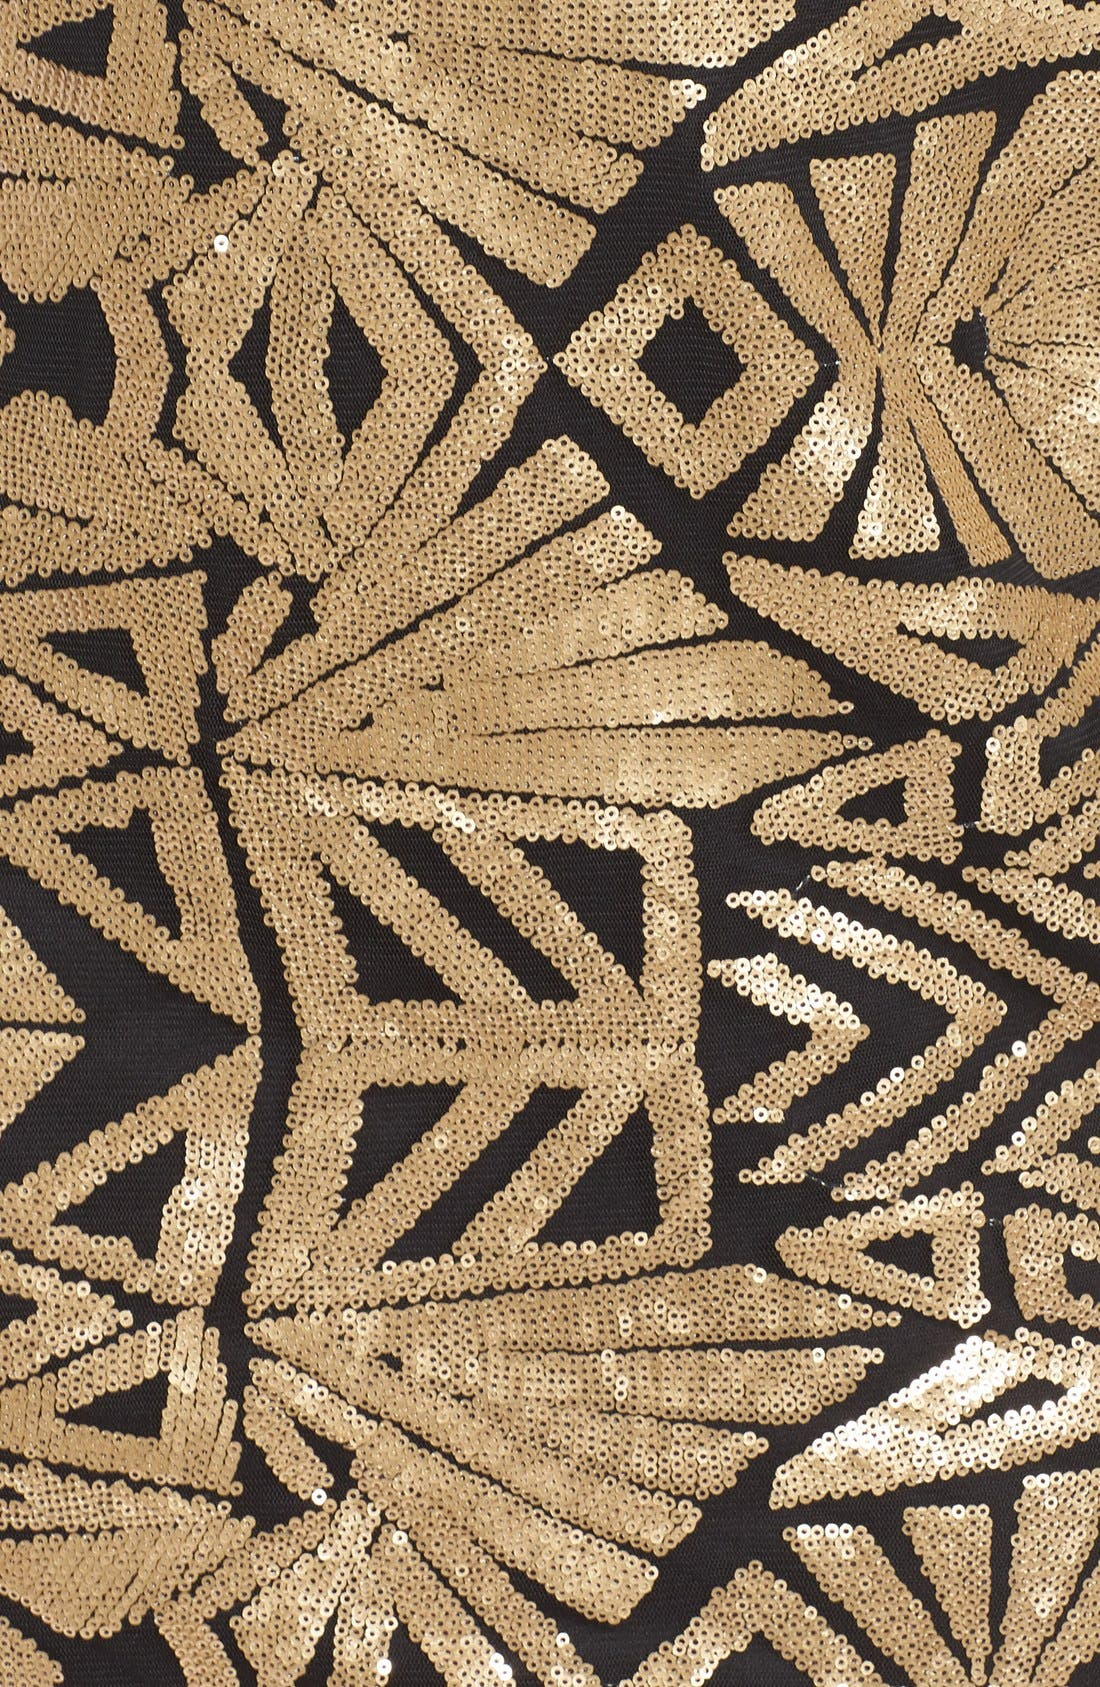 V-Neck Sequin Sheath Dress,                             Alternate thumbnail 5, color,                             Gold